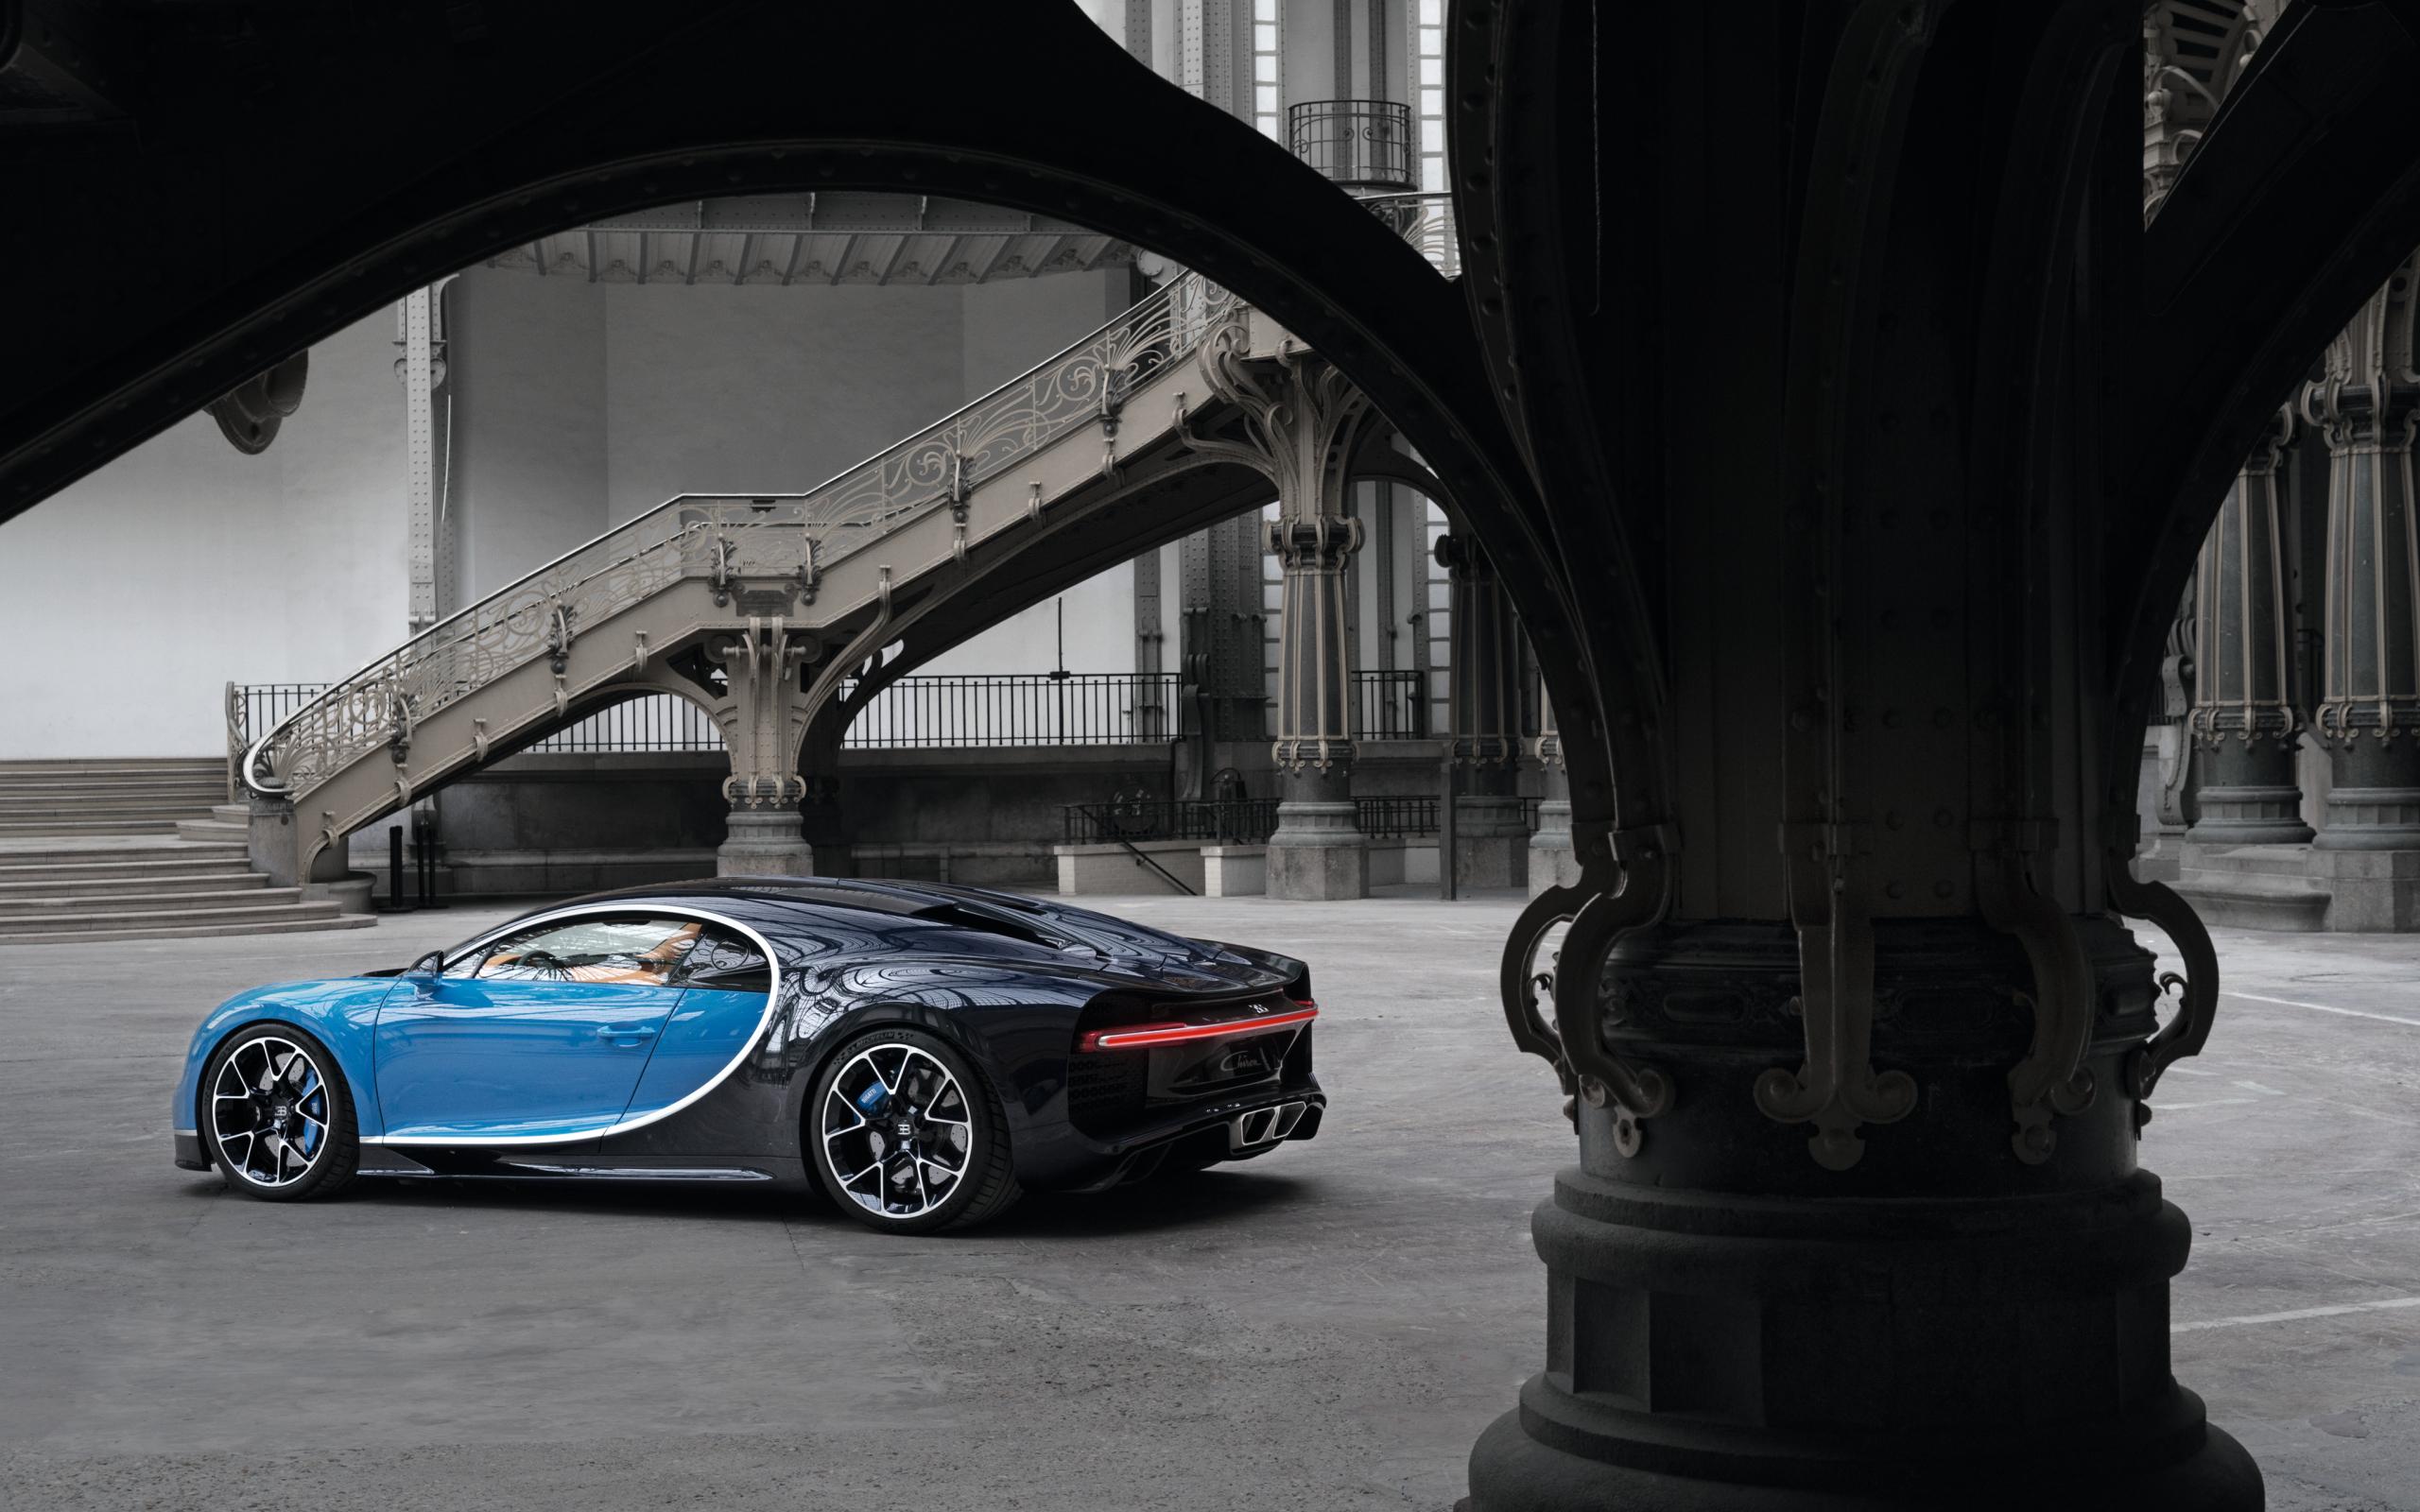 Download Bugatti Chiron Side View 1920x1080 Resolution Hd